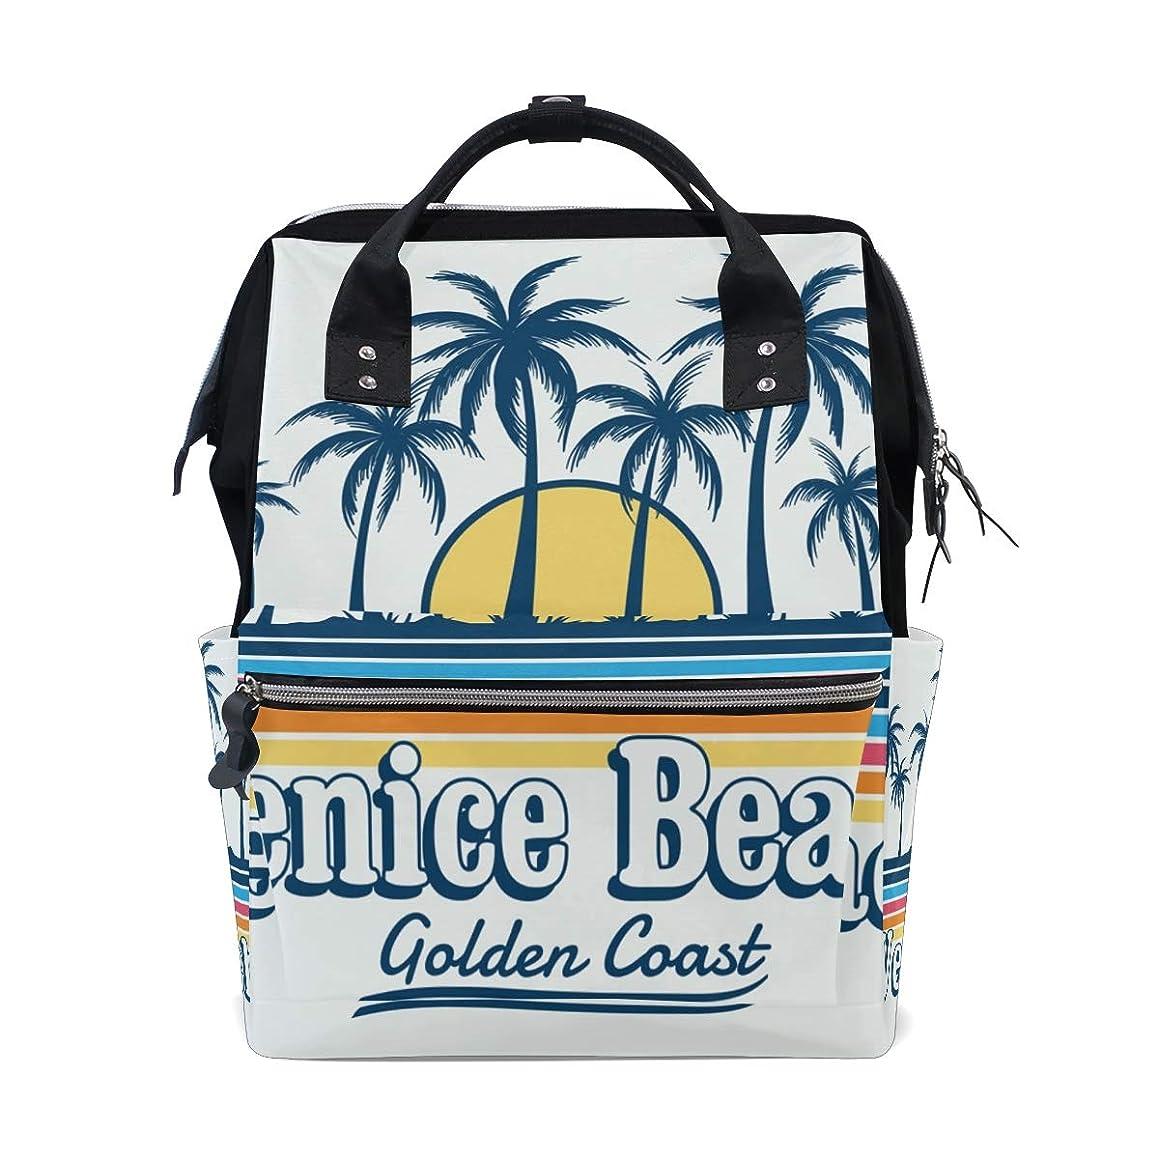 Venice Beach Coconut Tree Sunset School Backpack Large Capacity Mummy Bags Laptop Handbag Casual Travel Rucksack Satchel For Women Men Adult Teen Children